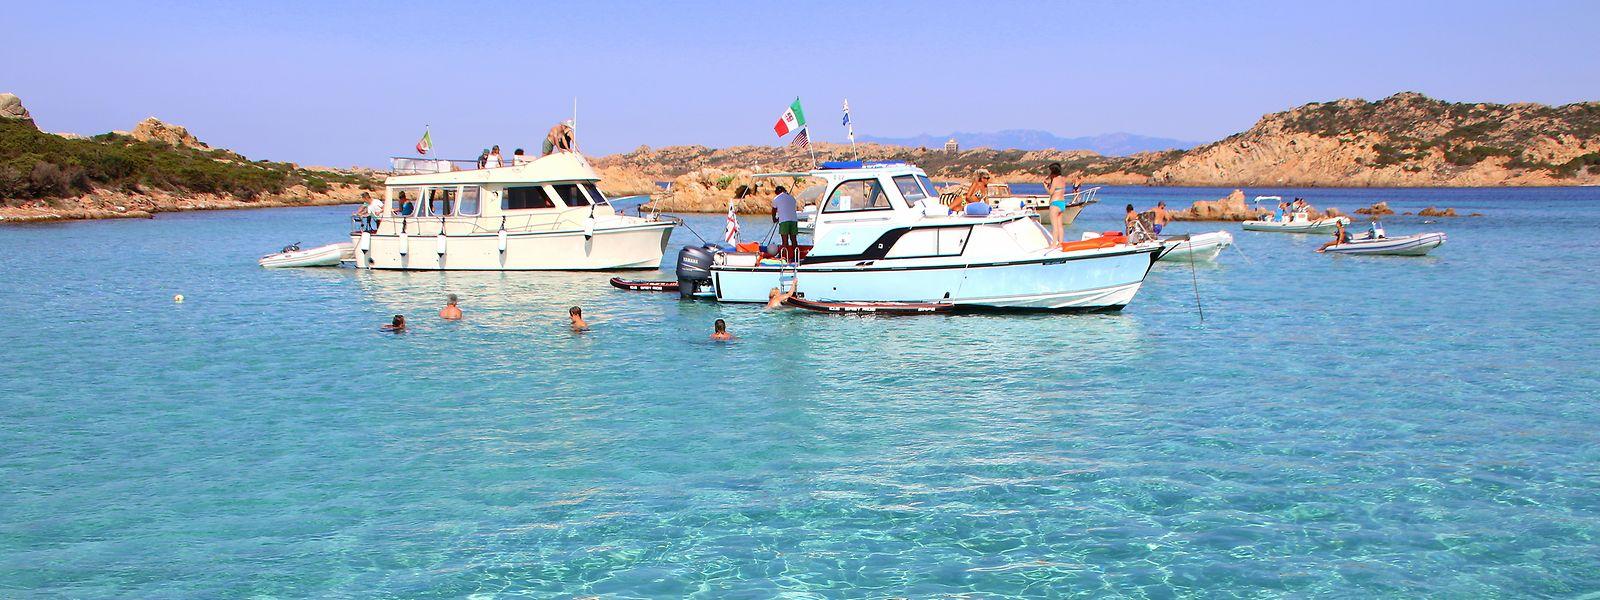 Motorboote vor der Insel Razzoli im La Maddalena-Nationalpark.